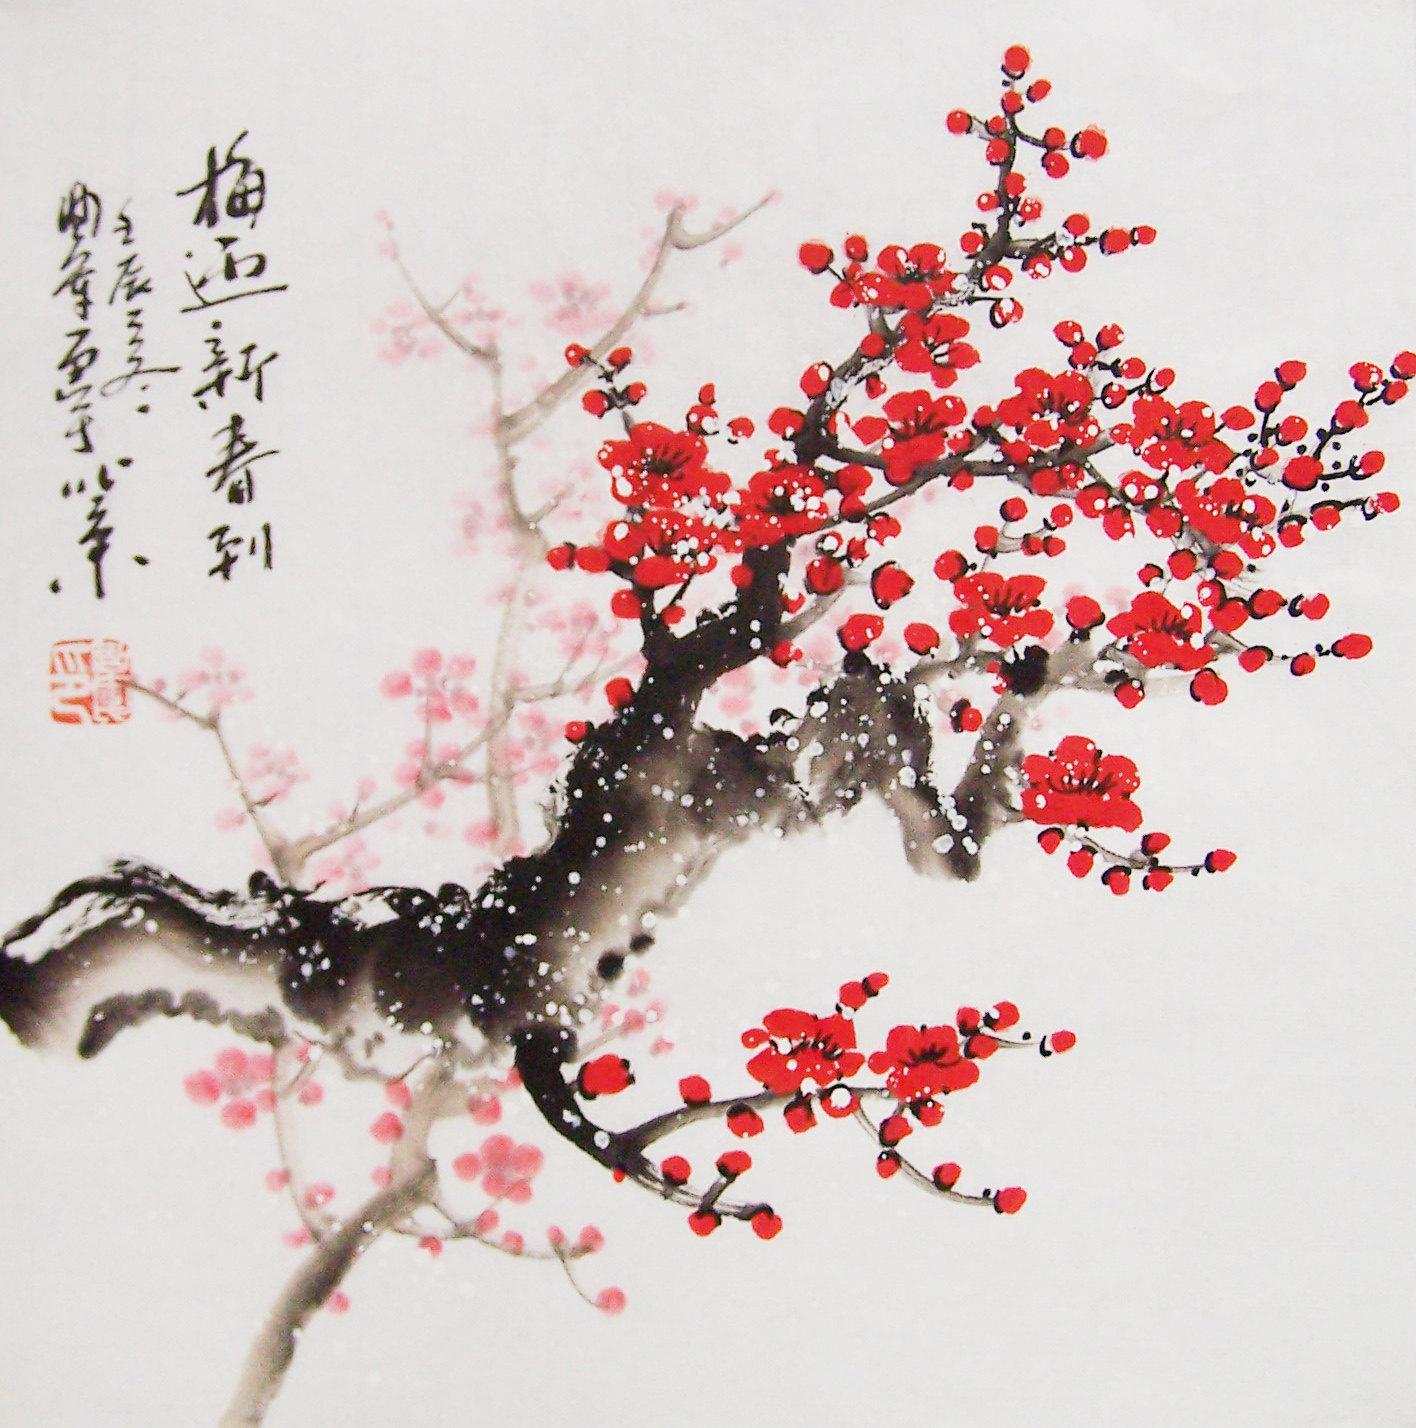 Drawn sakura blossom japanese writing Japanese cherry  Search Google